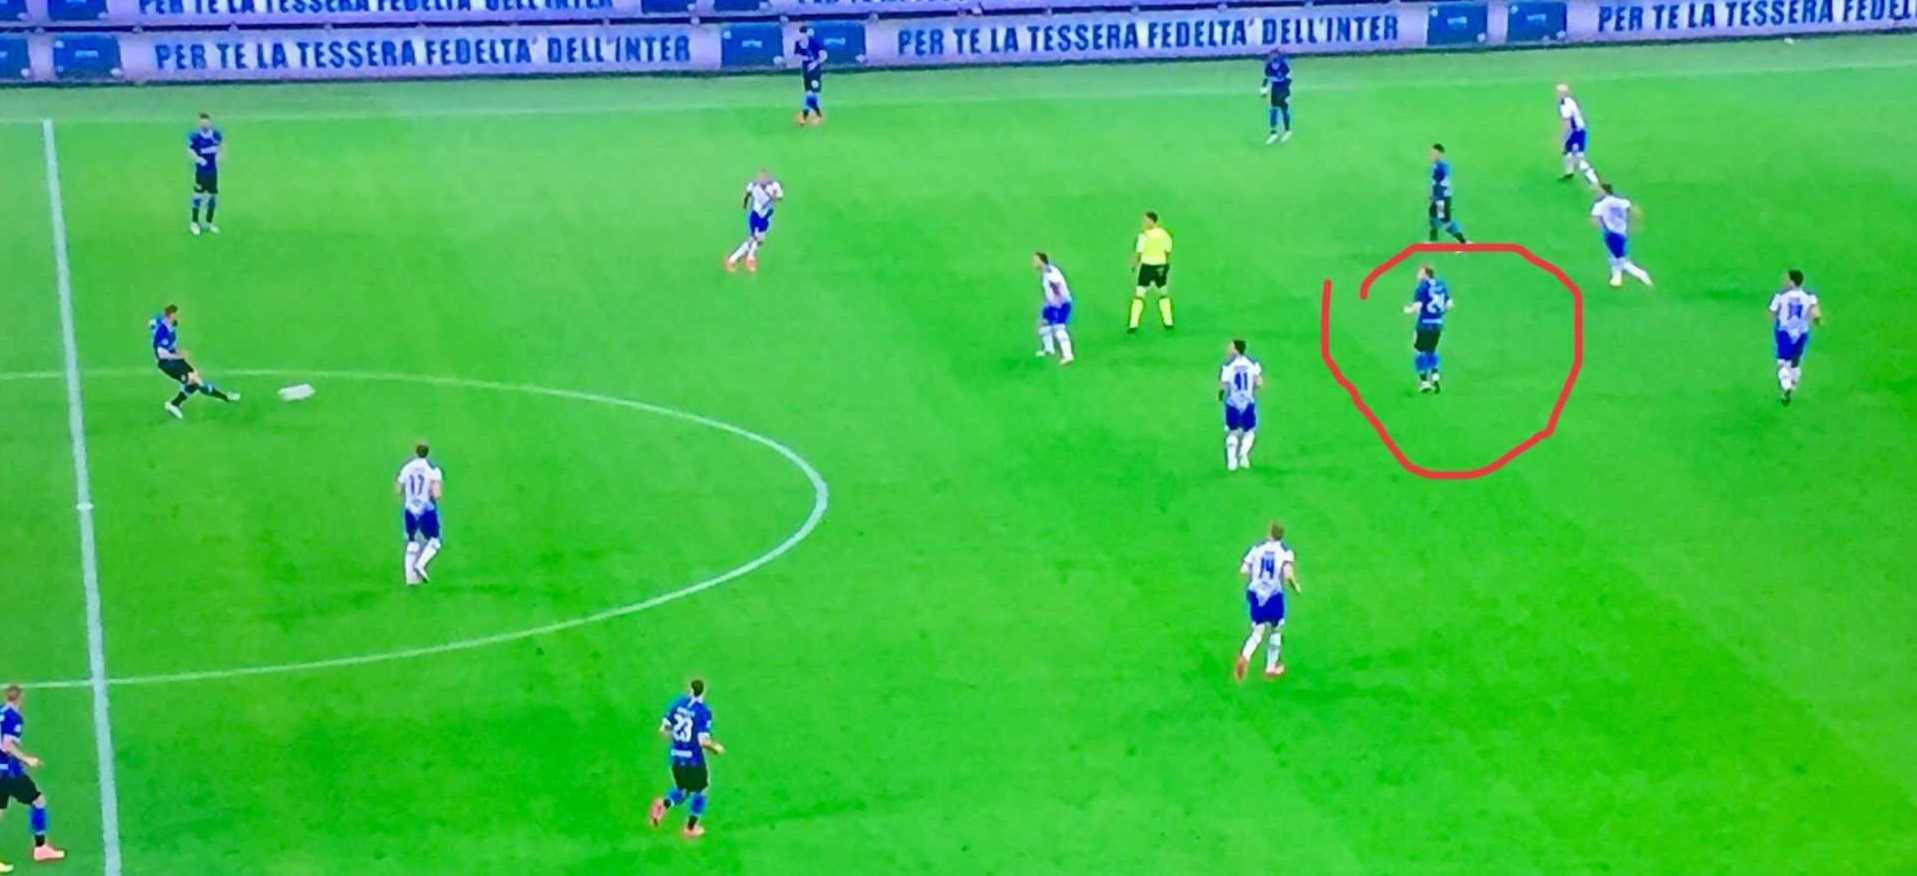 Inter-Sampdoria (2-1): analisi tattica e considerazioni